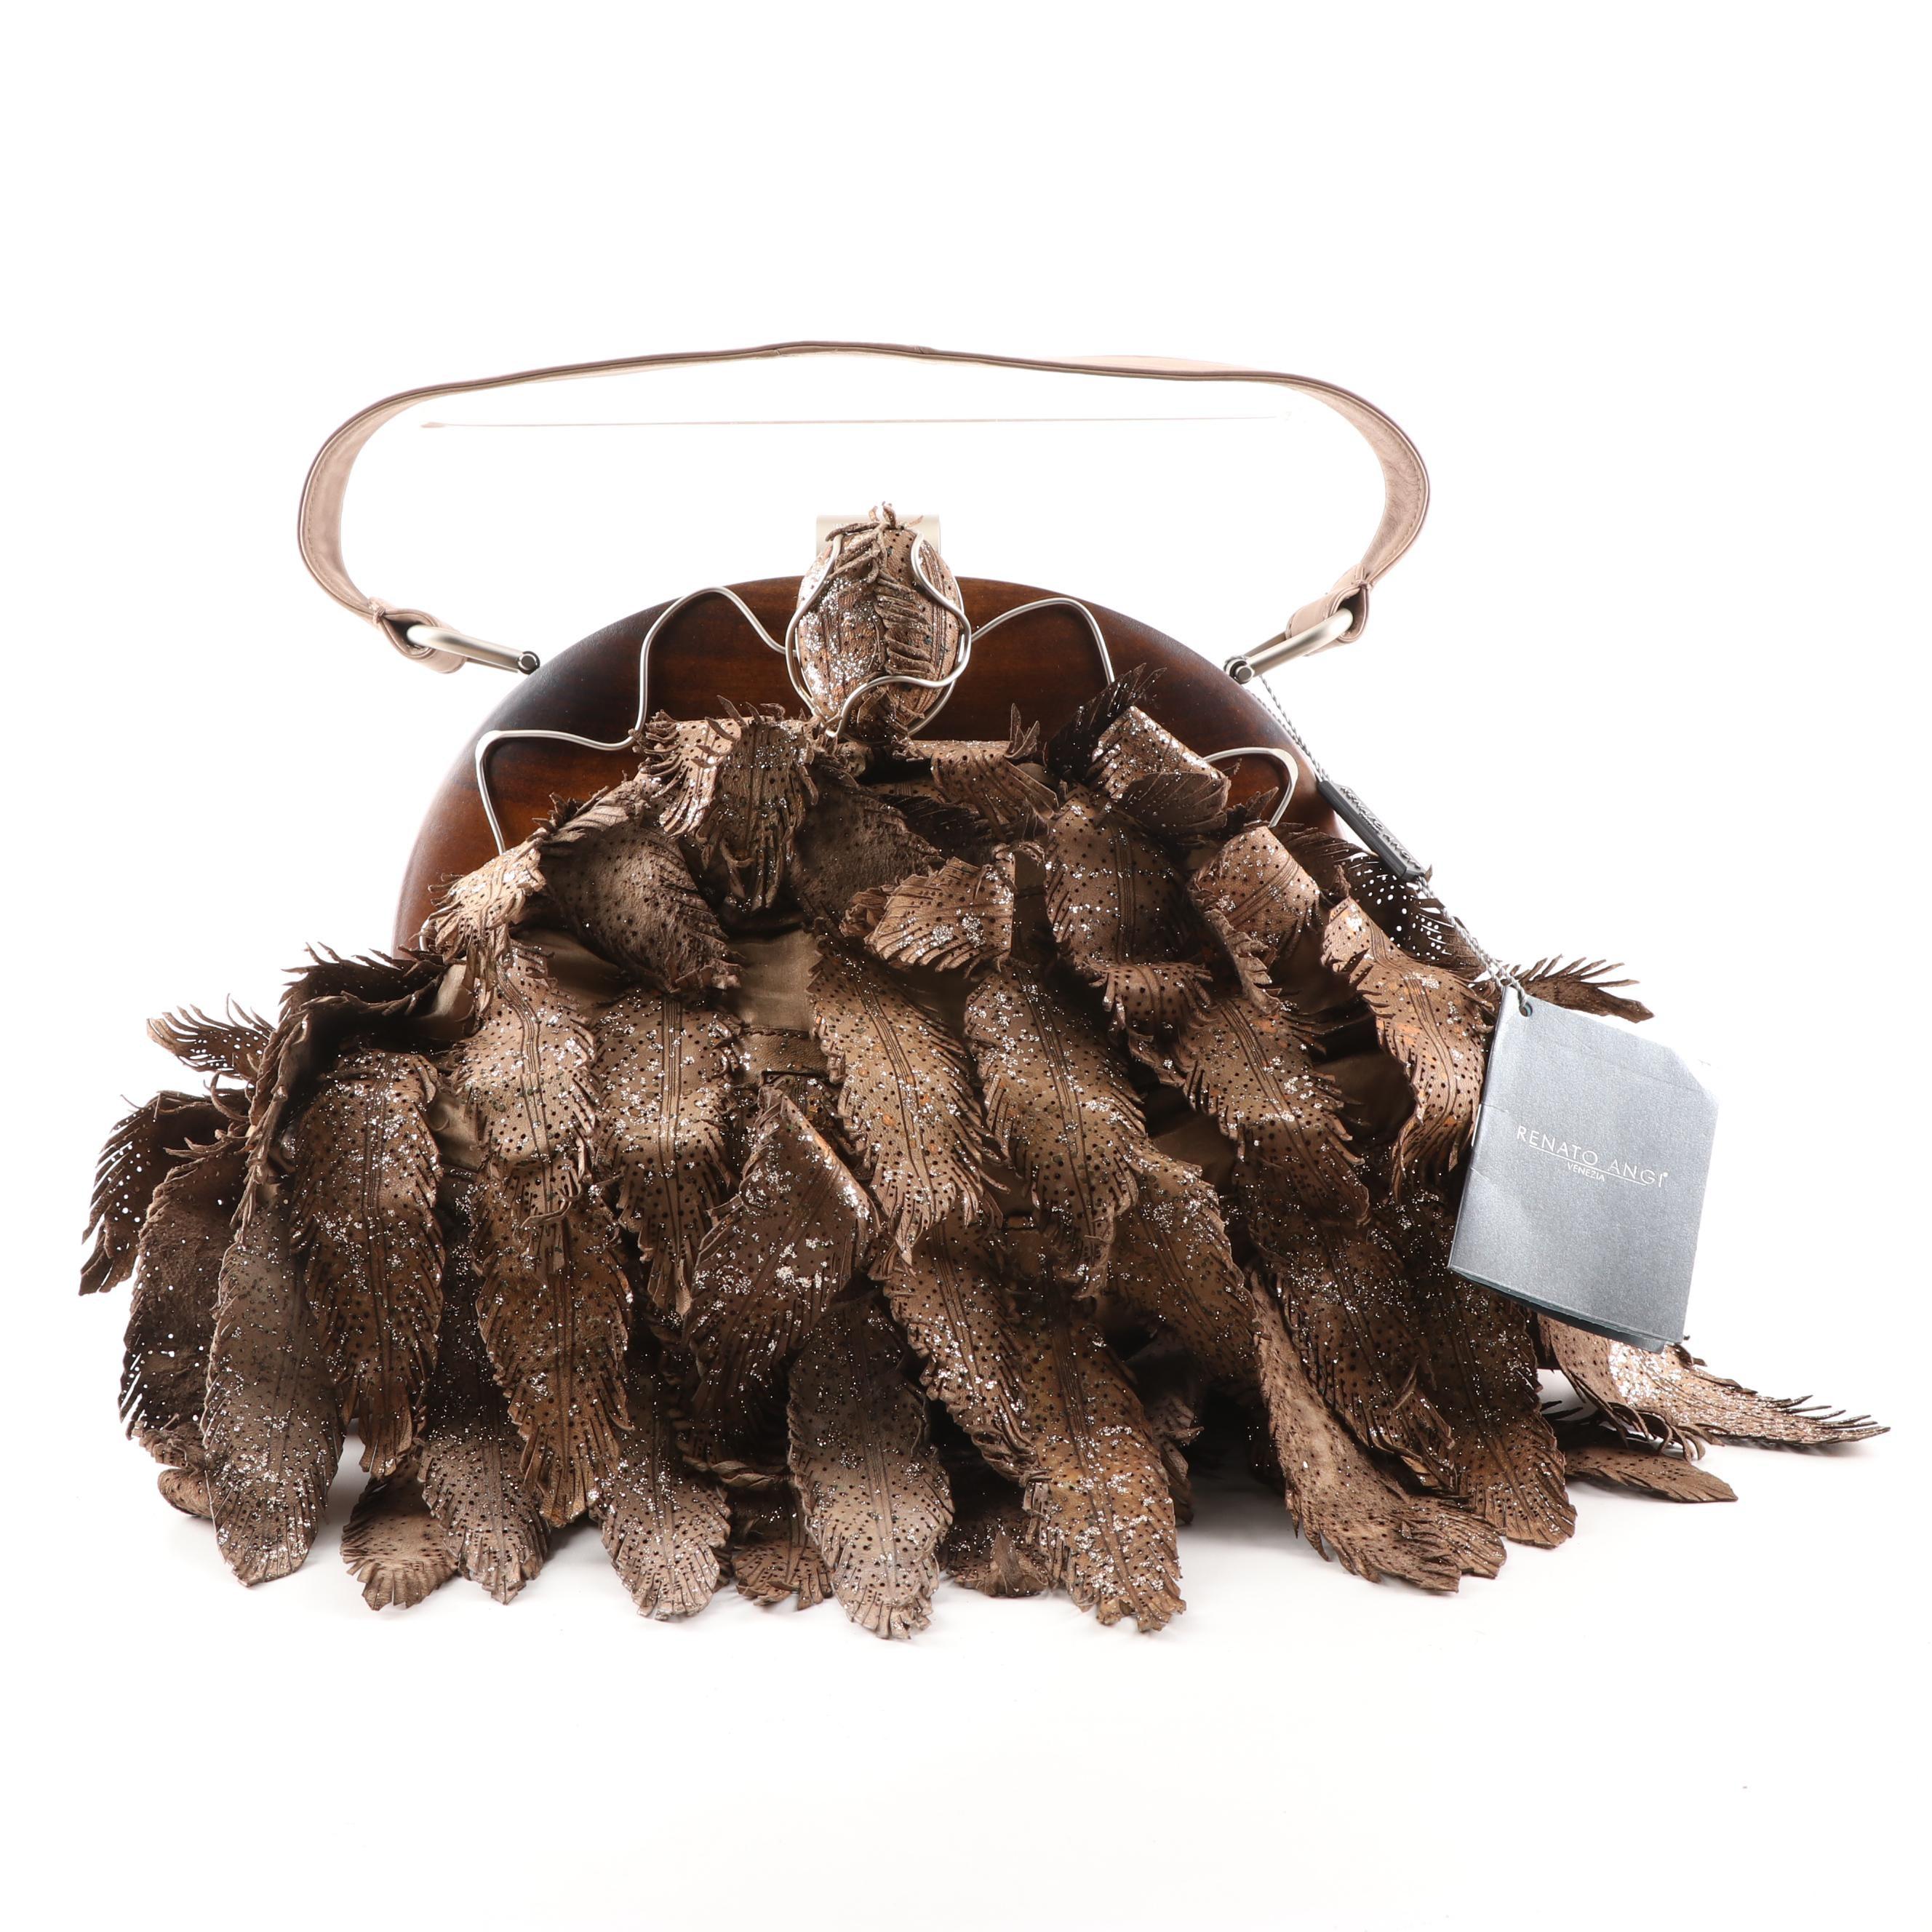 Renato Angi Metallic Feathered Mocha Leather Handbag with Wood Frame